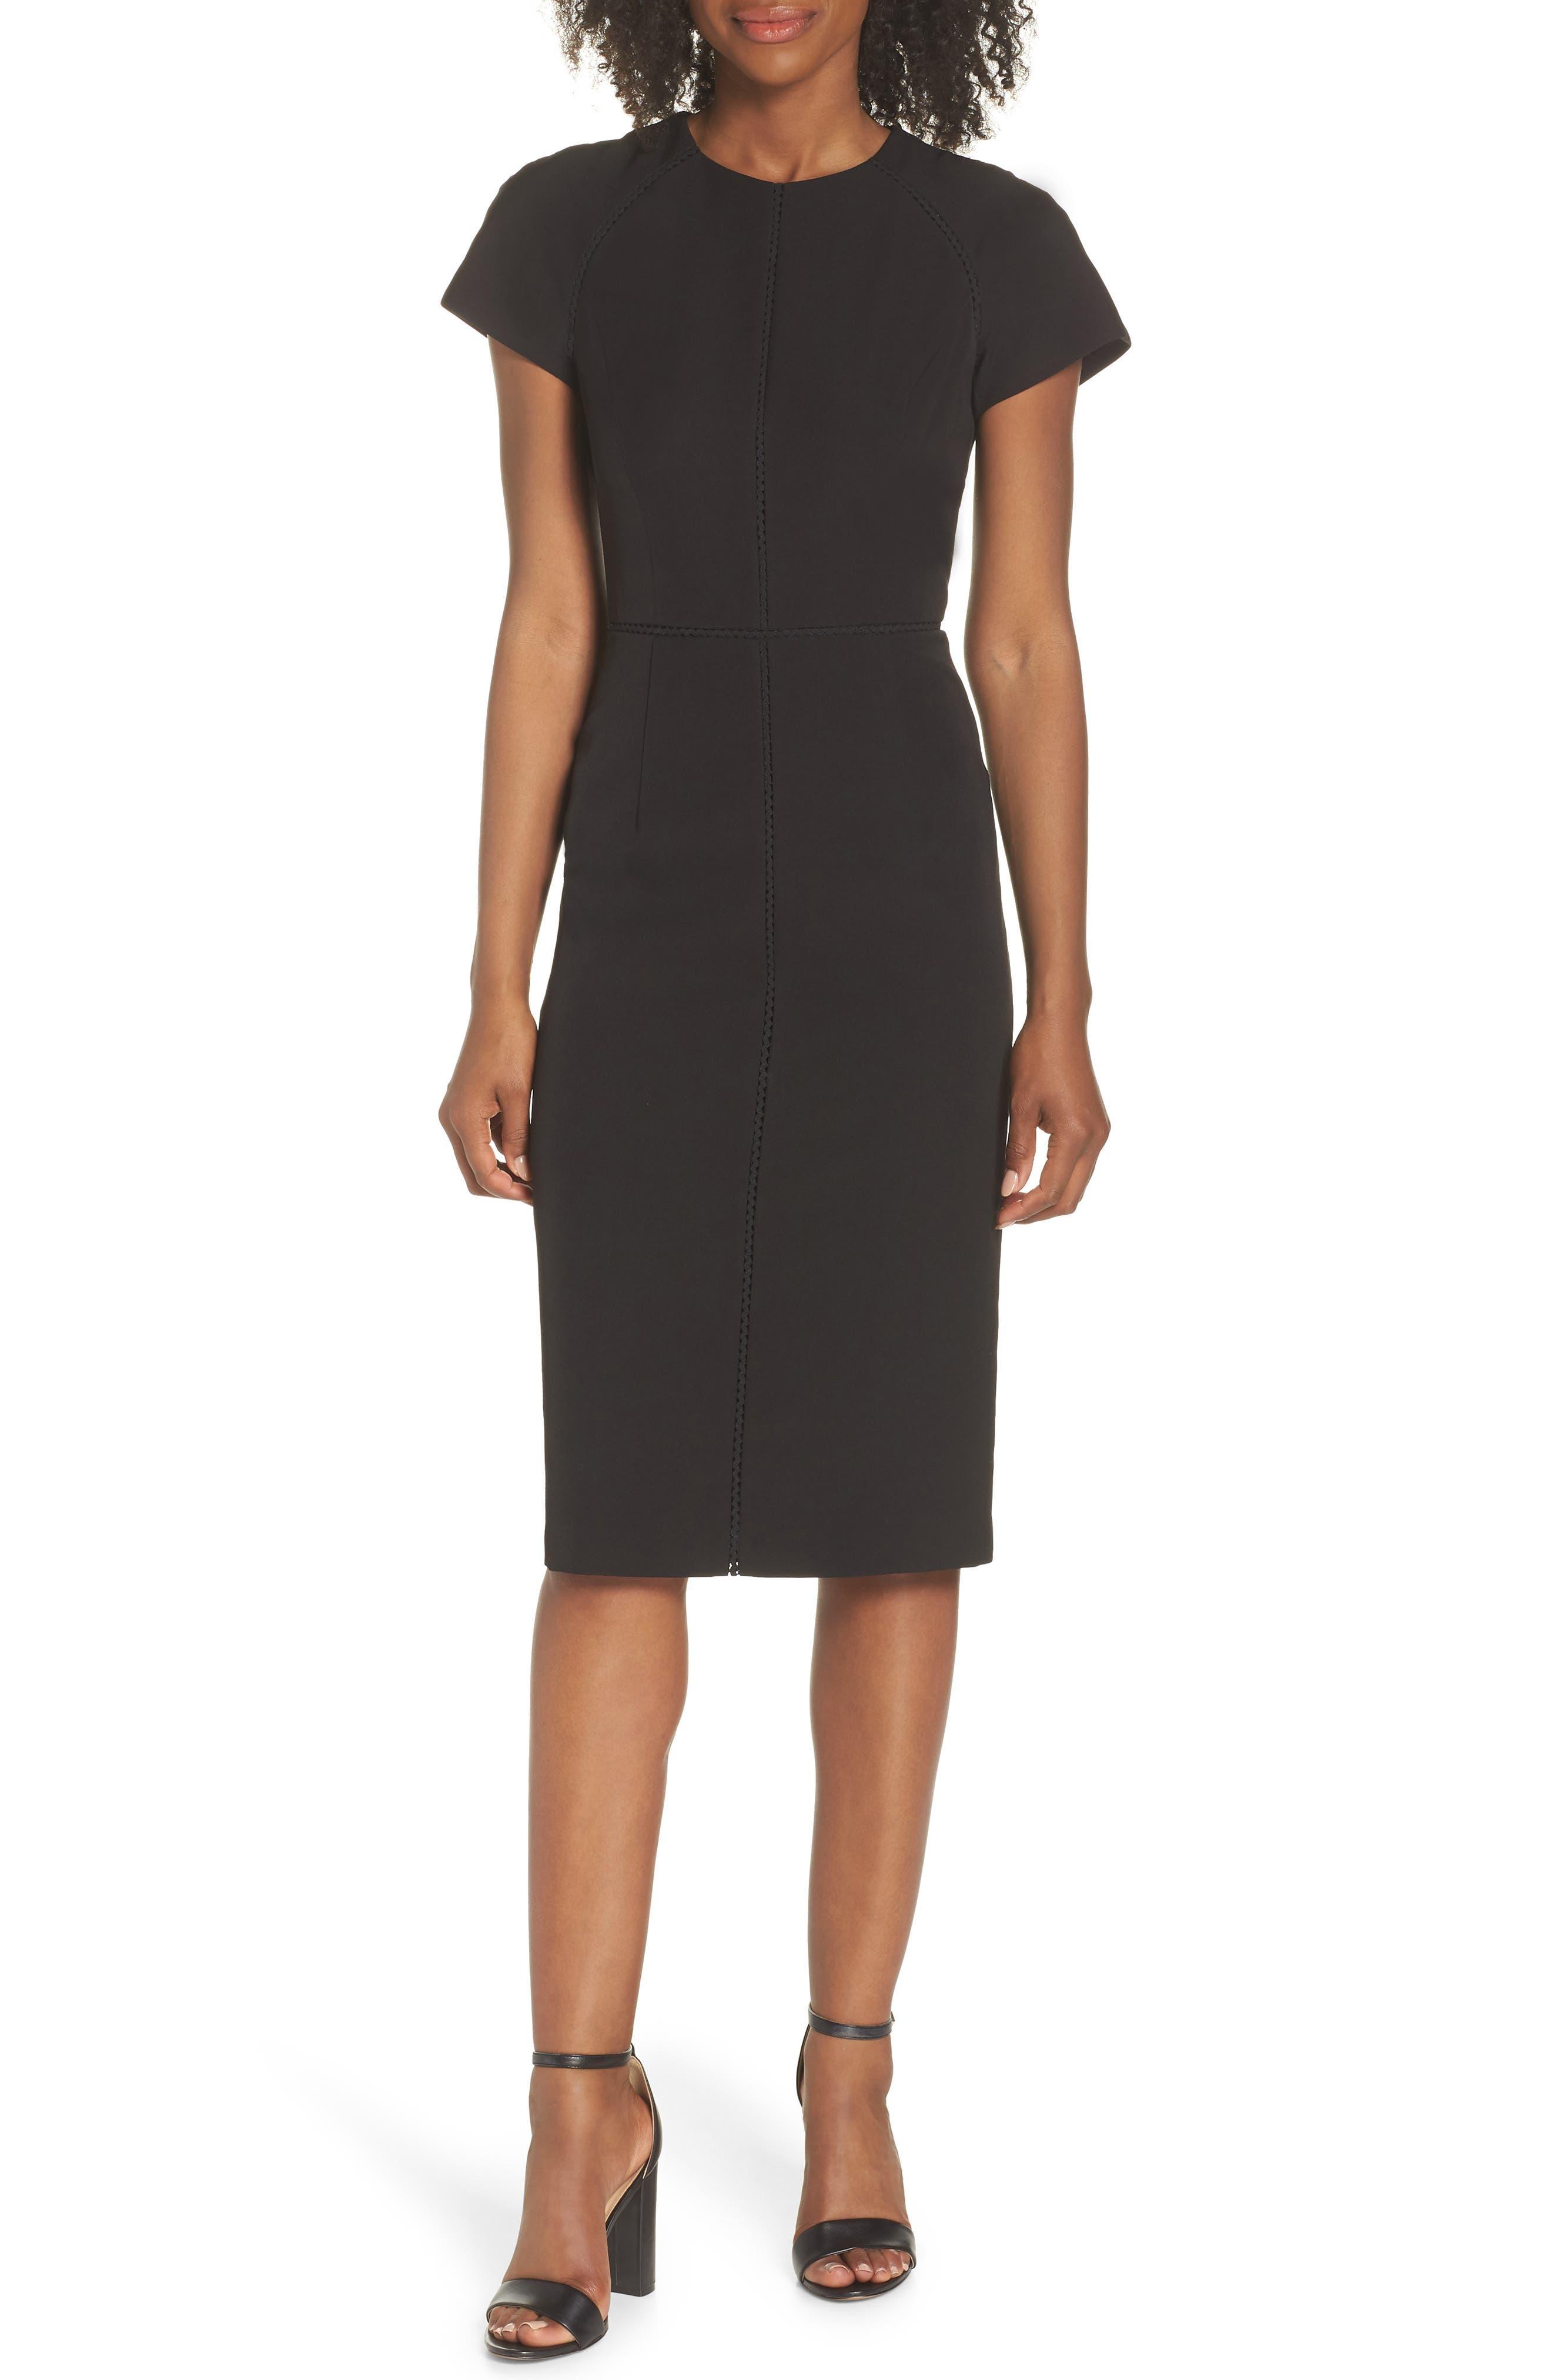 Sale alerts for  Dream Crepe Sheath Dress - Covvet